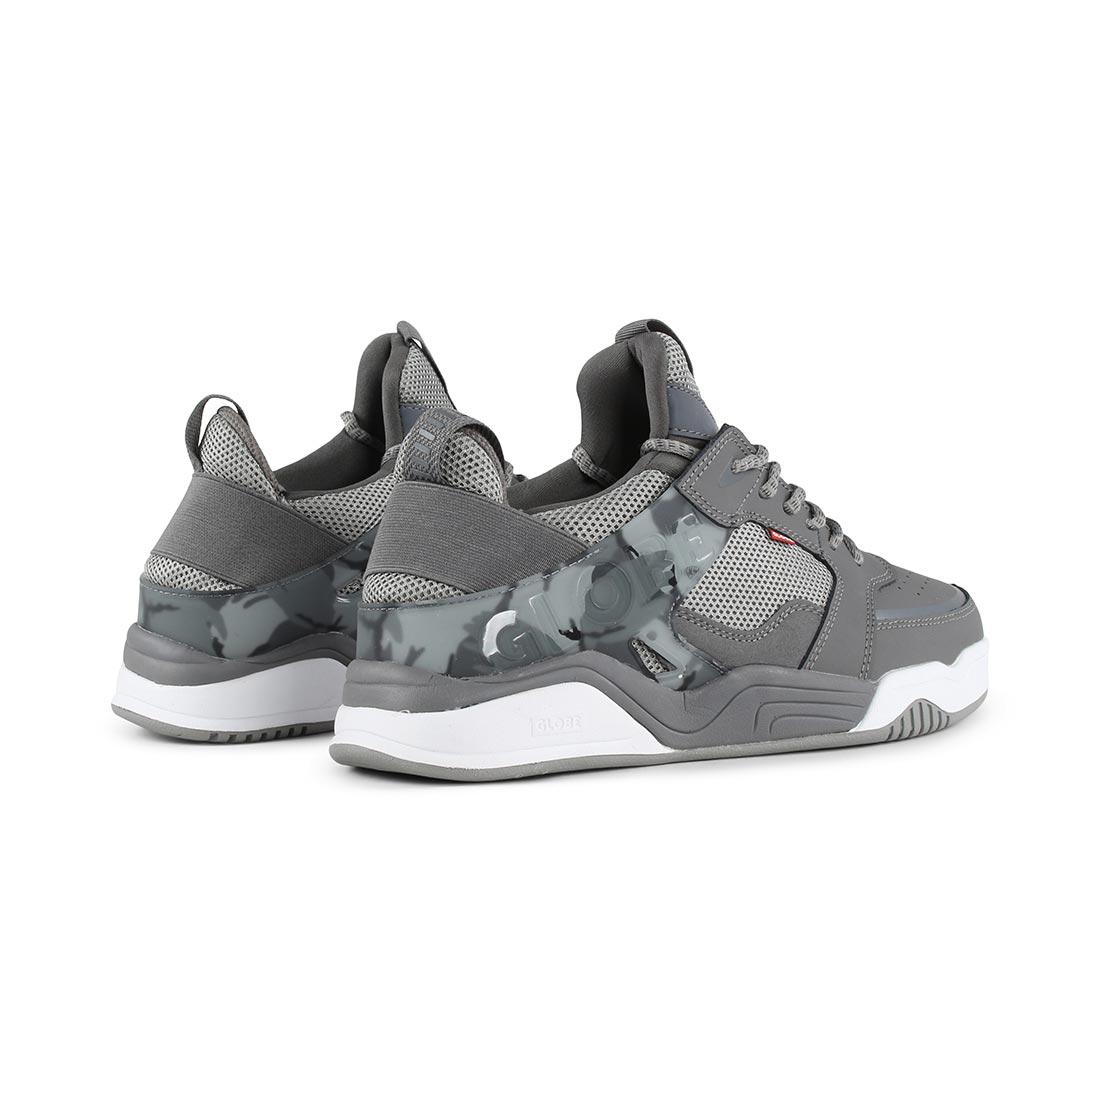 c97cce96bcea2 Globe Tilt Evo Shoes - Grey / Grey / Camo